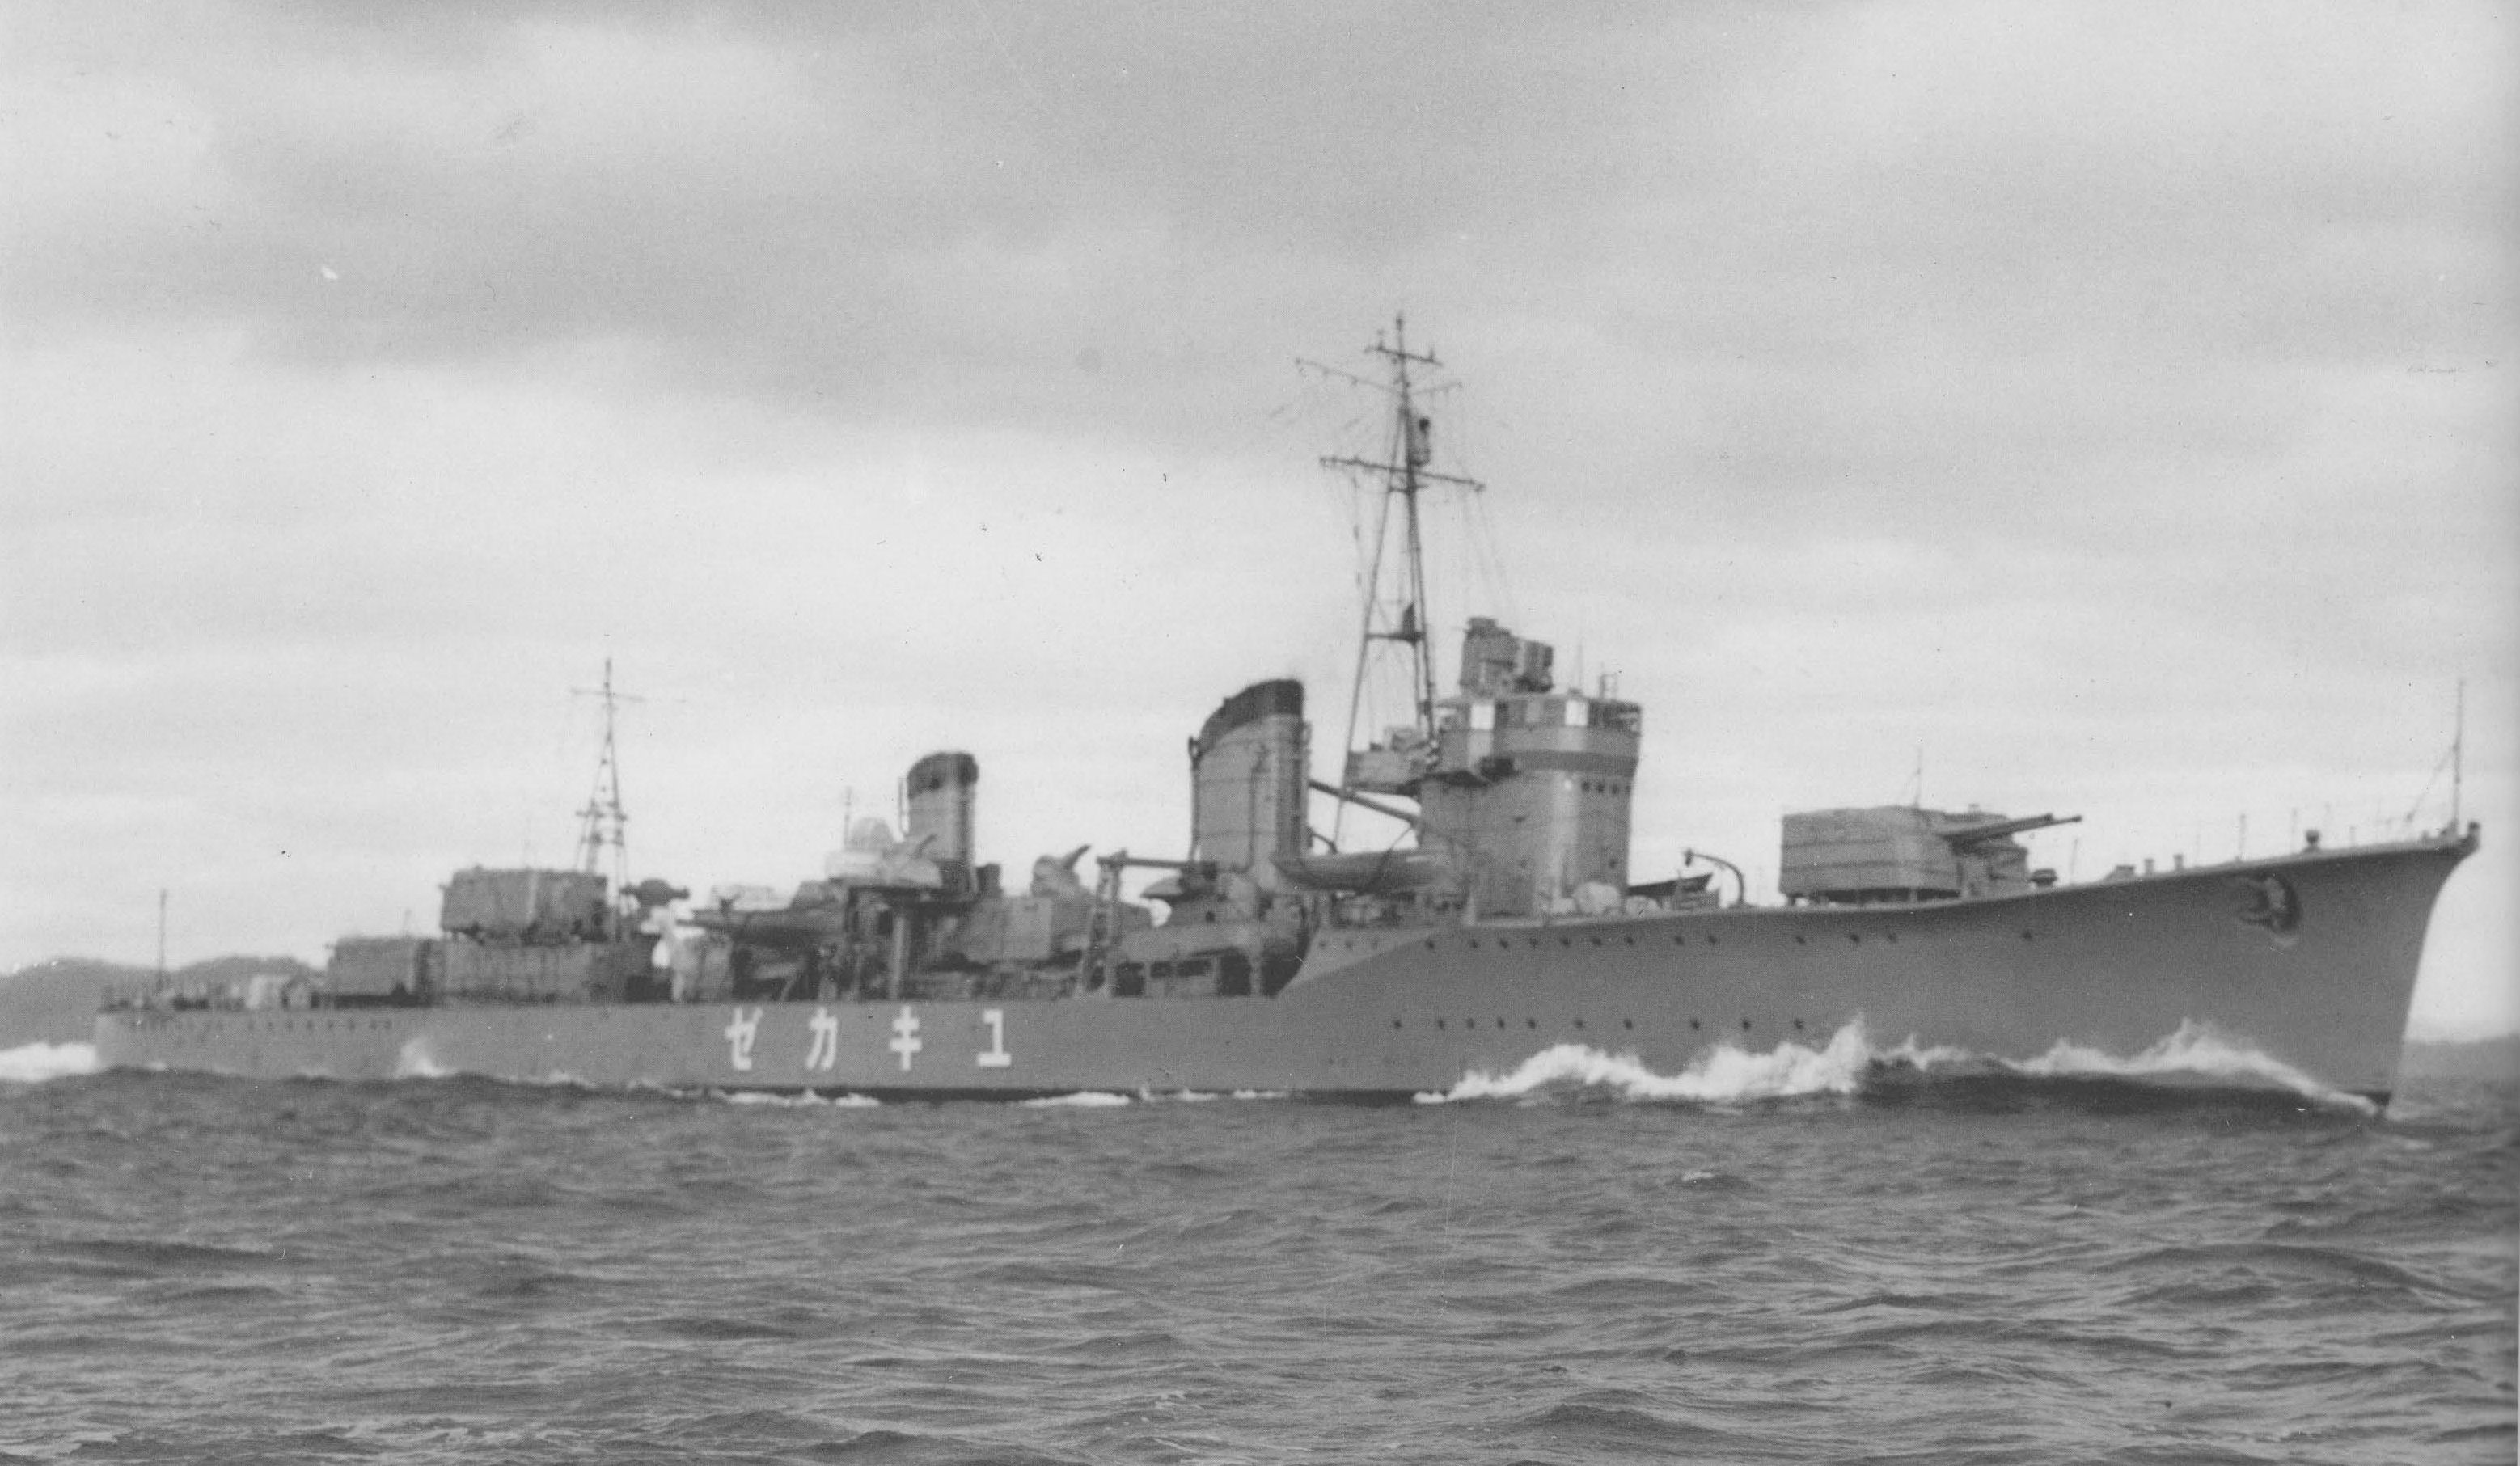 https://upload.wikimedia.org/wikipedia/commons/0/06/Yukikaze_2.jpg